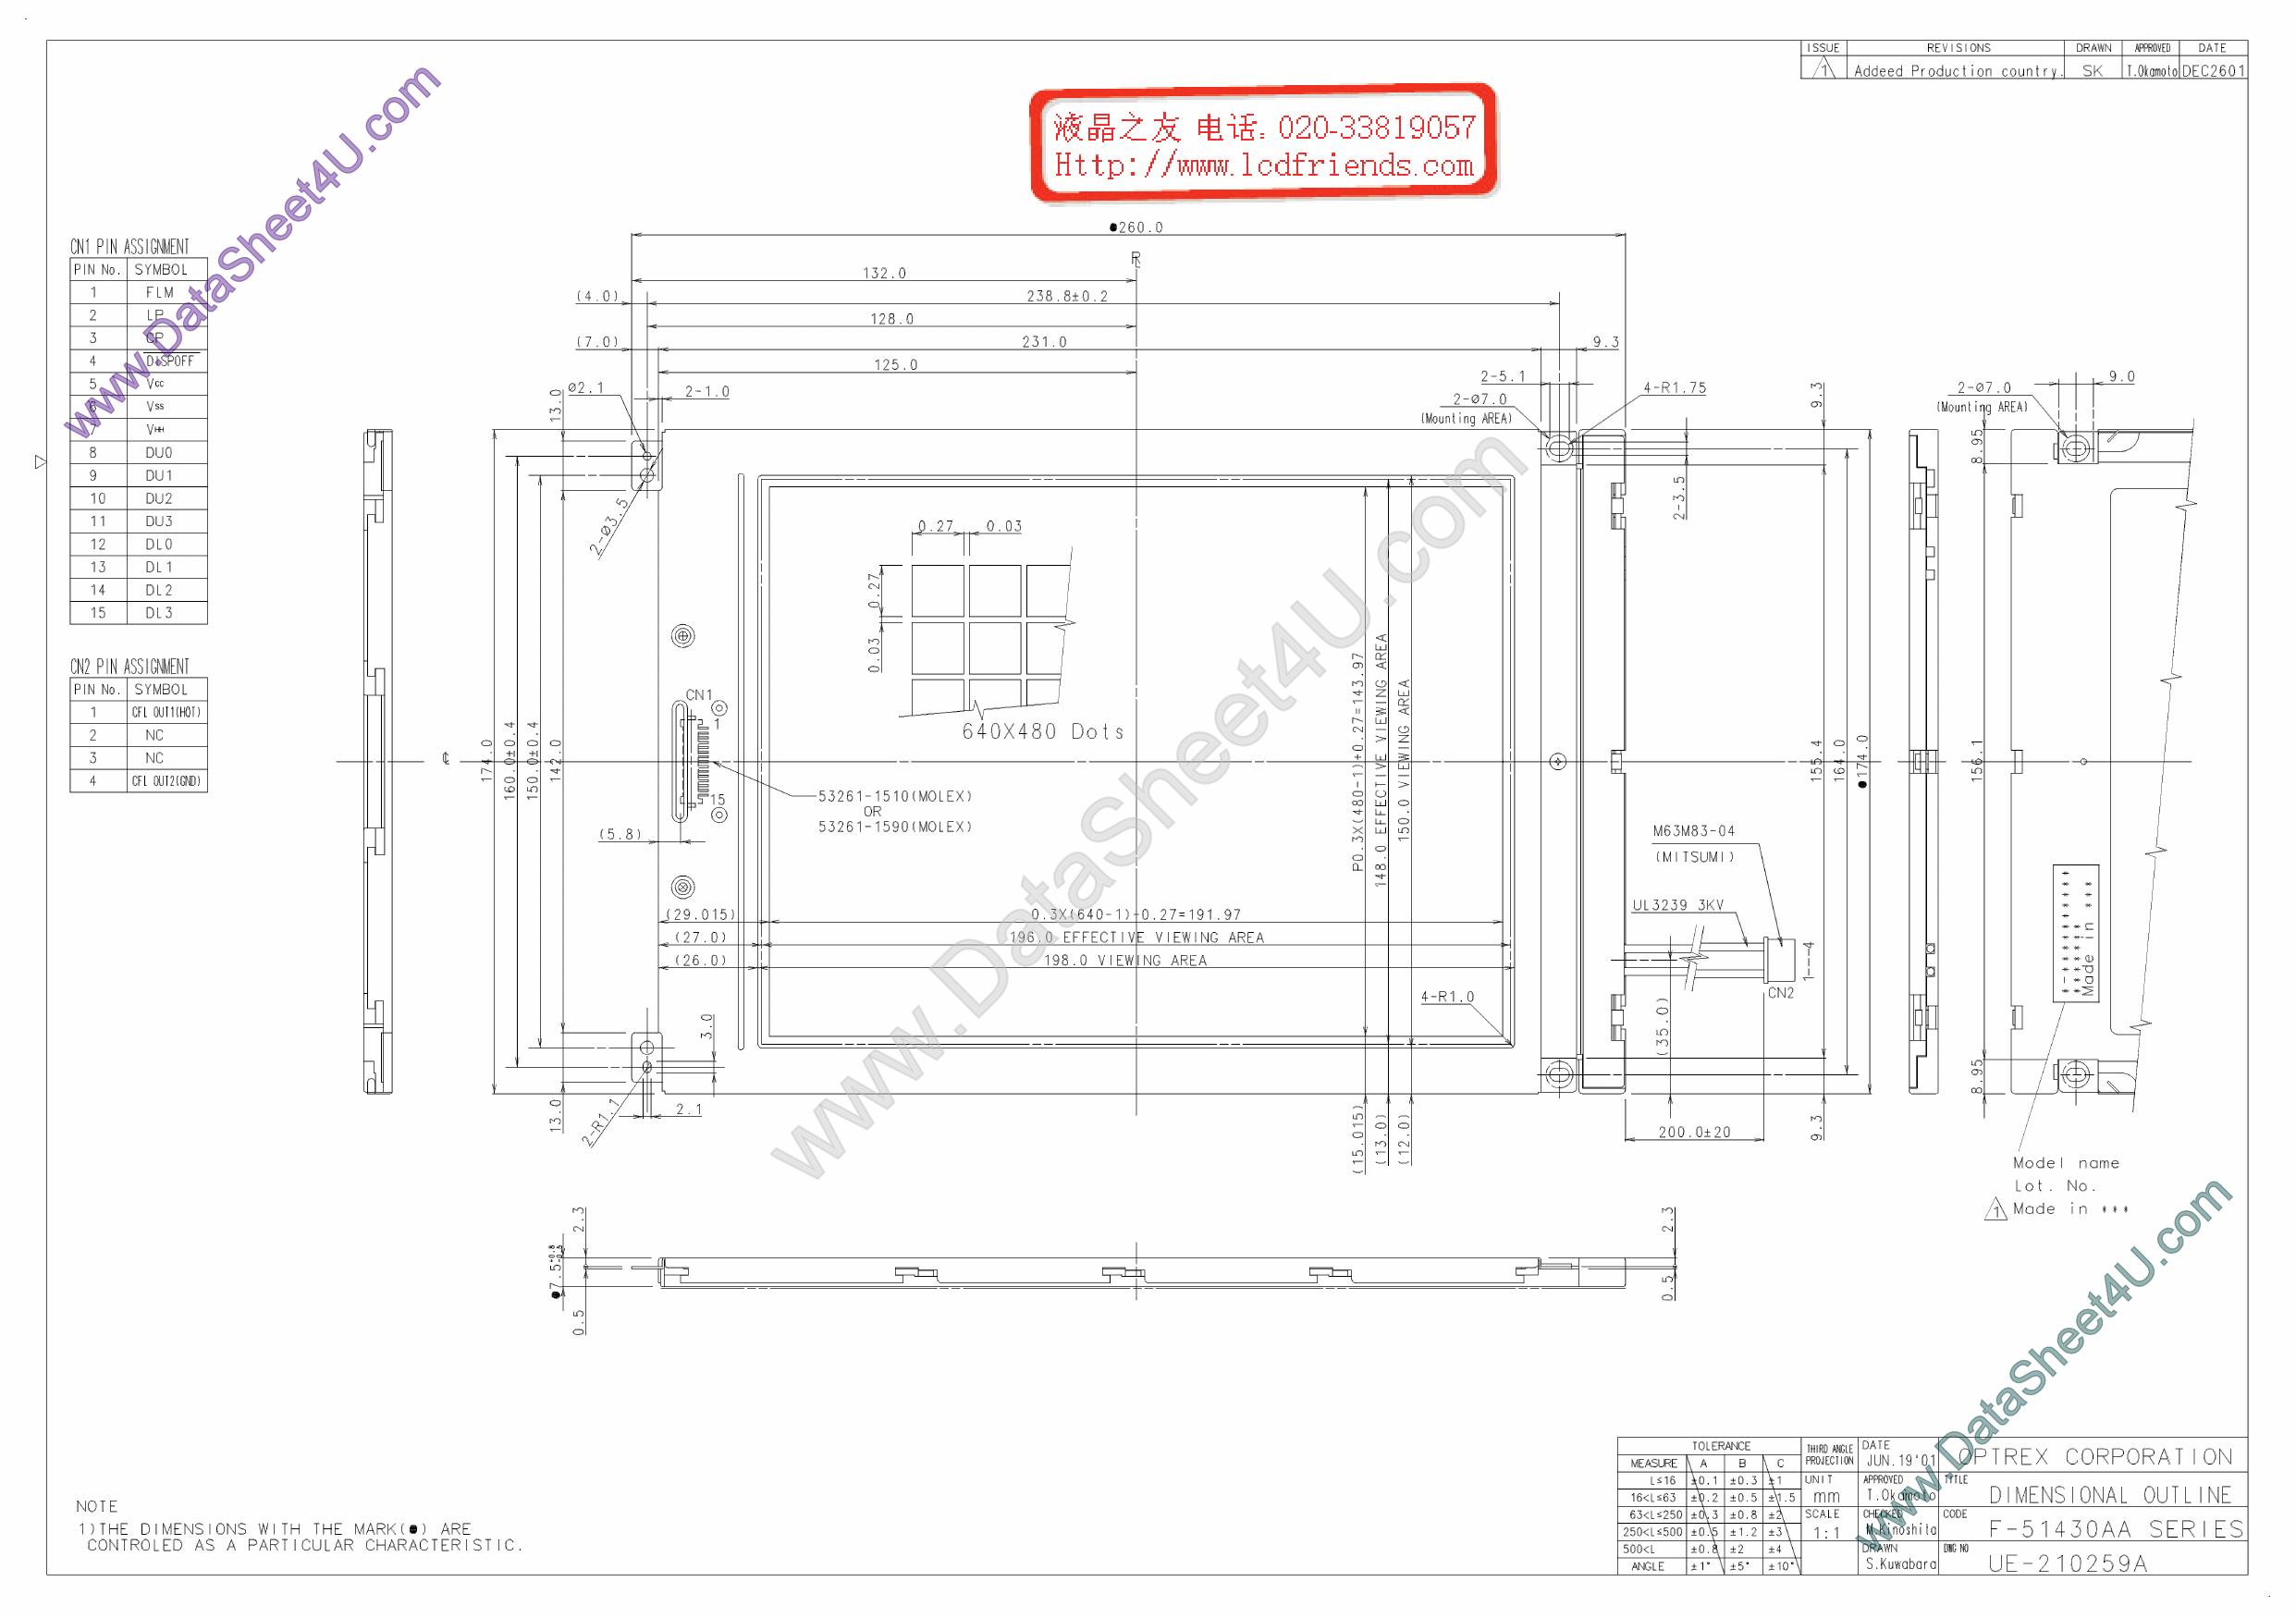 F-51430AA دیتاشیت PDF